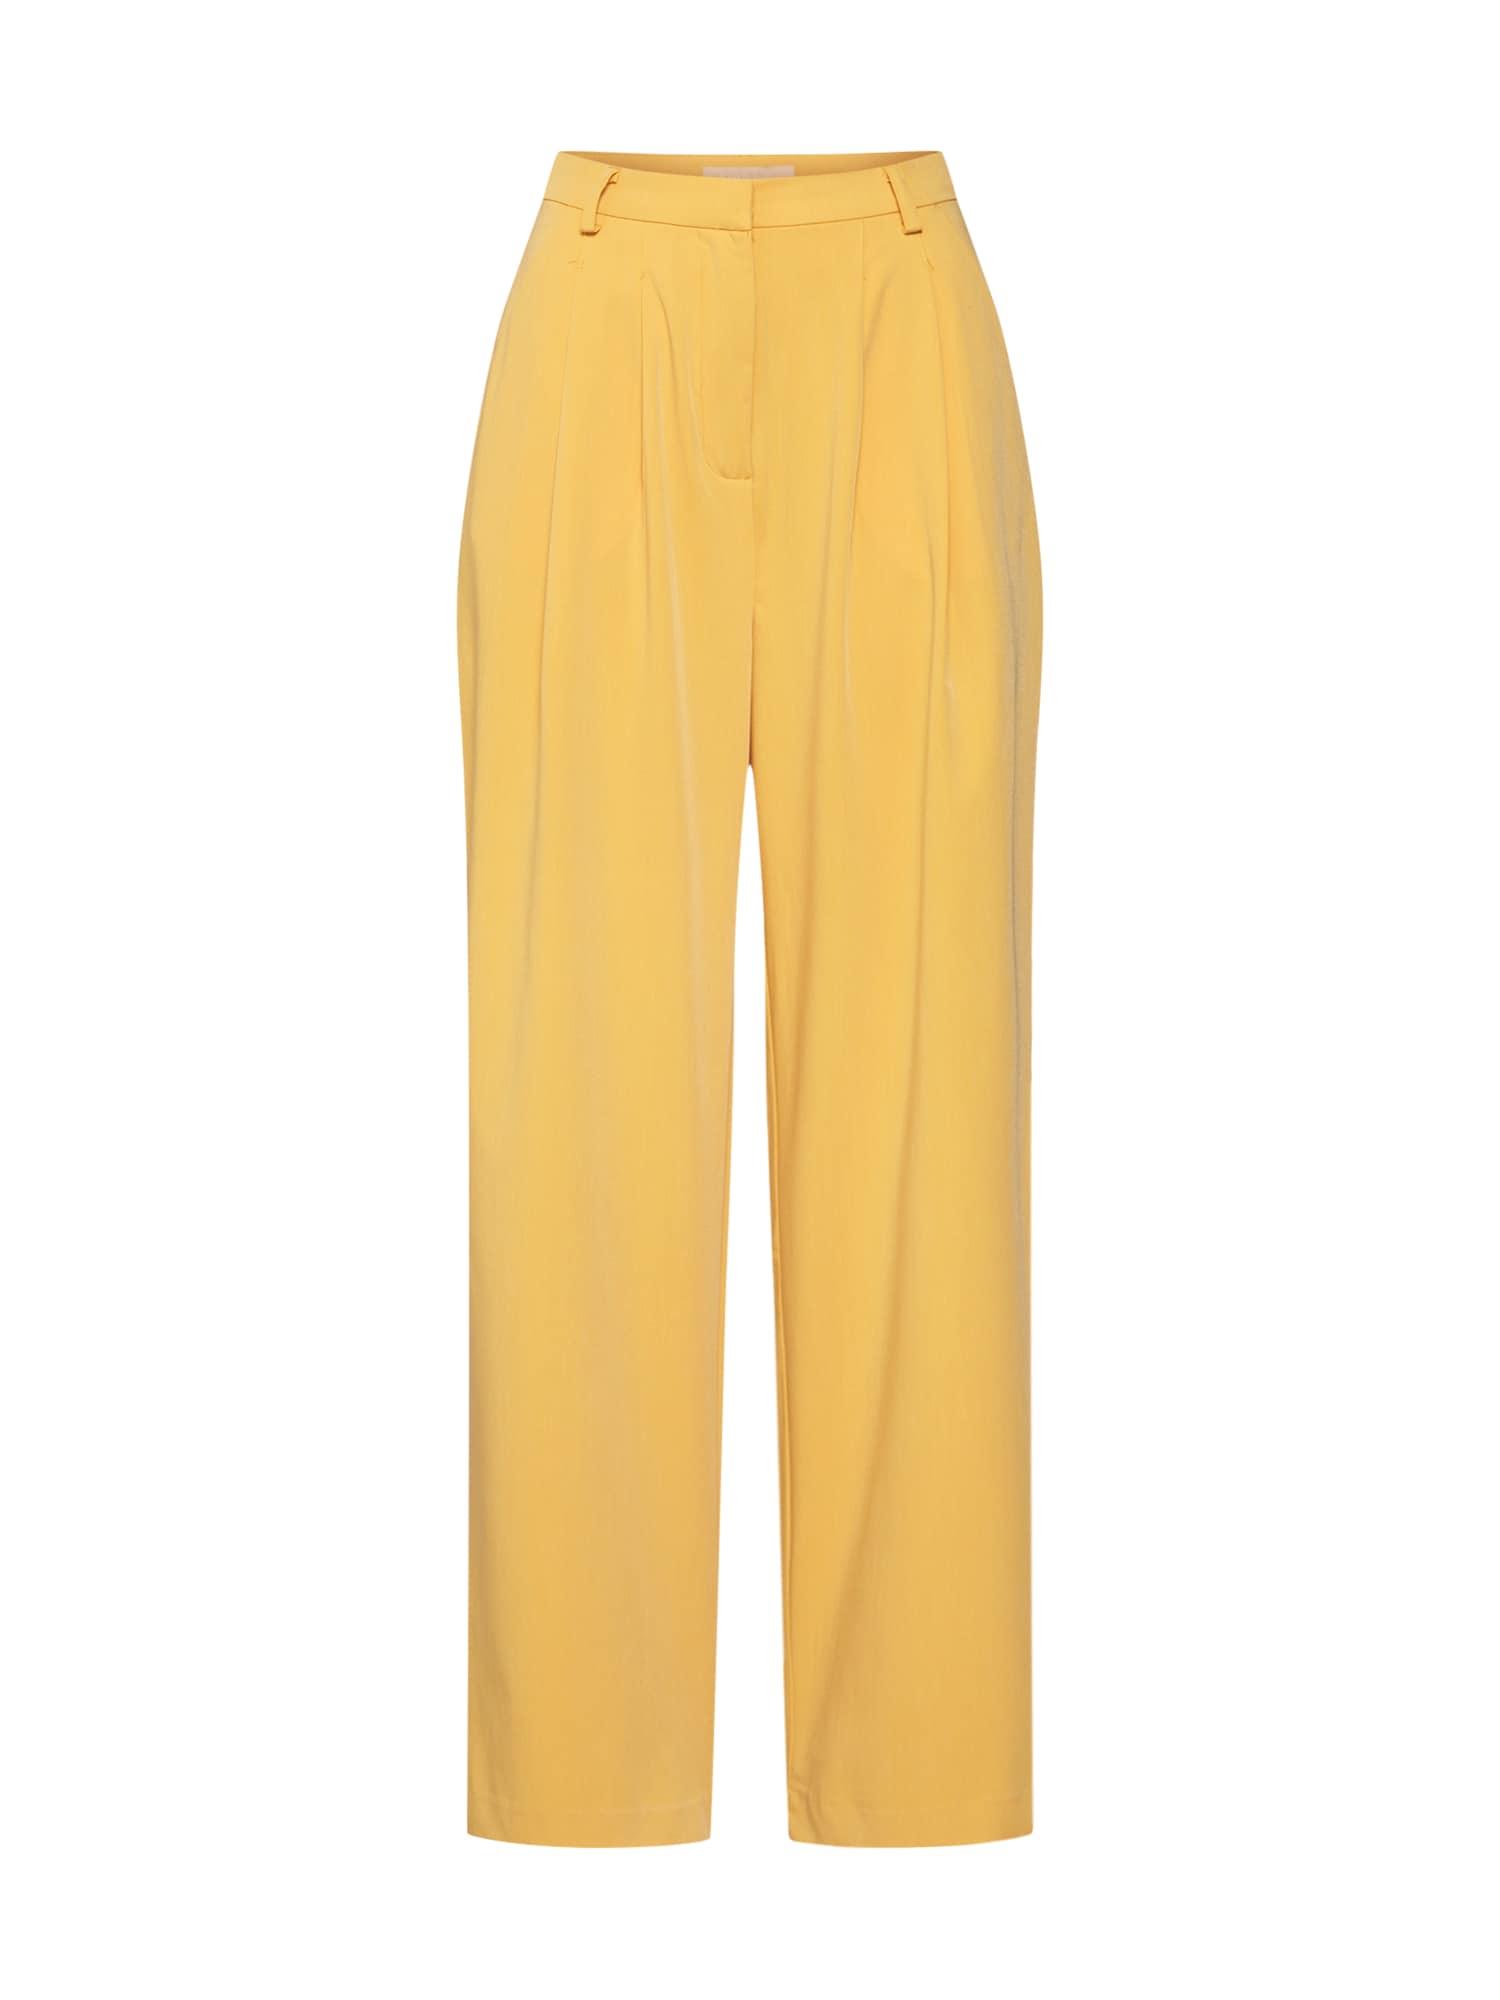 Soft Rebels Klostuotos kelnės 'Jamie' geltona